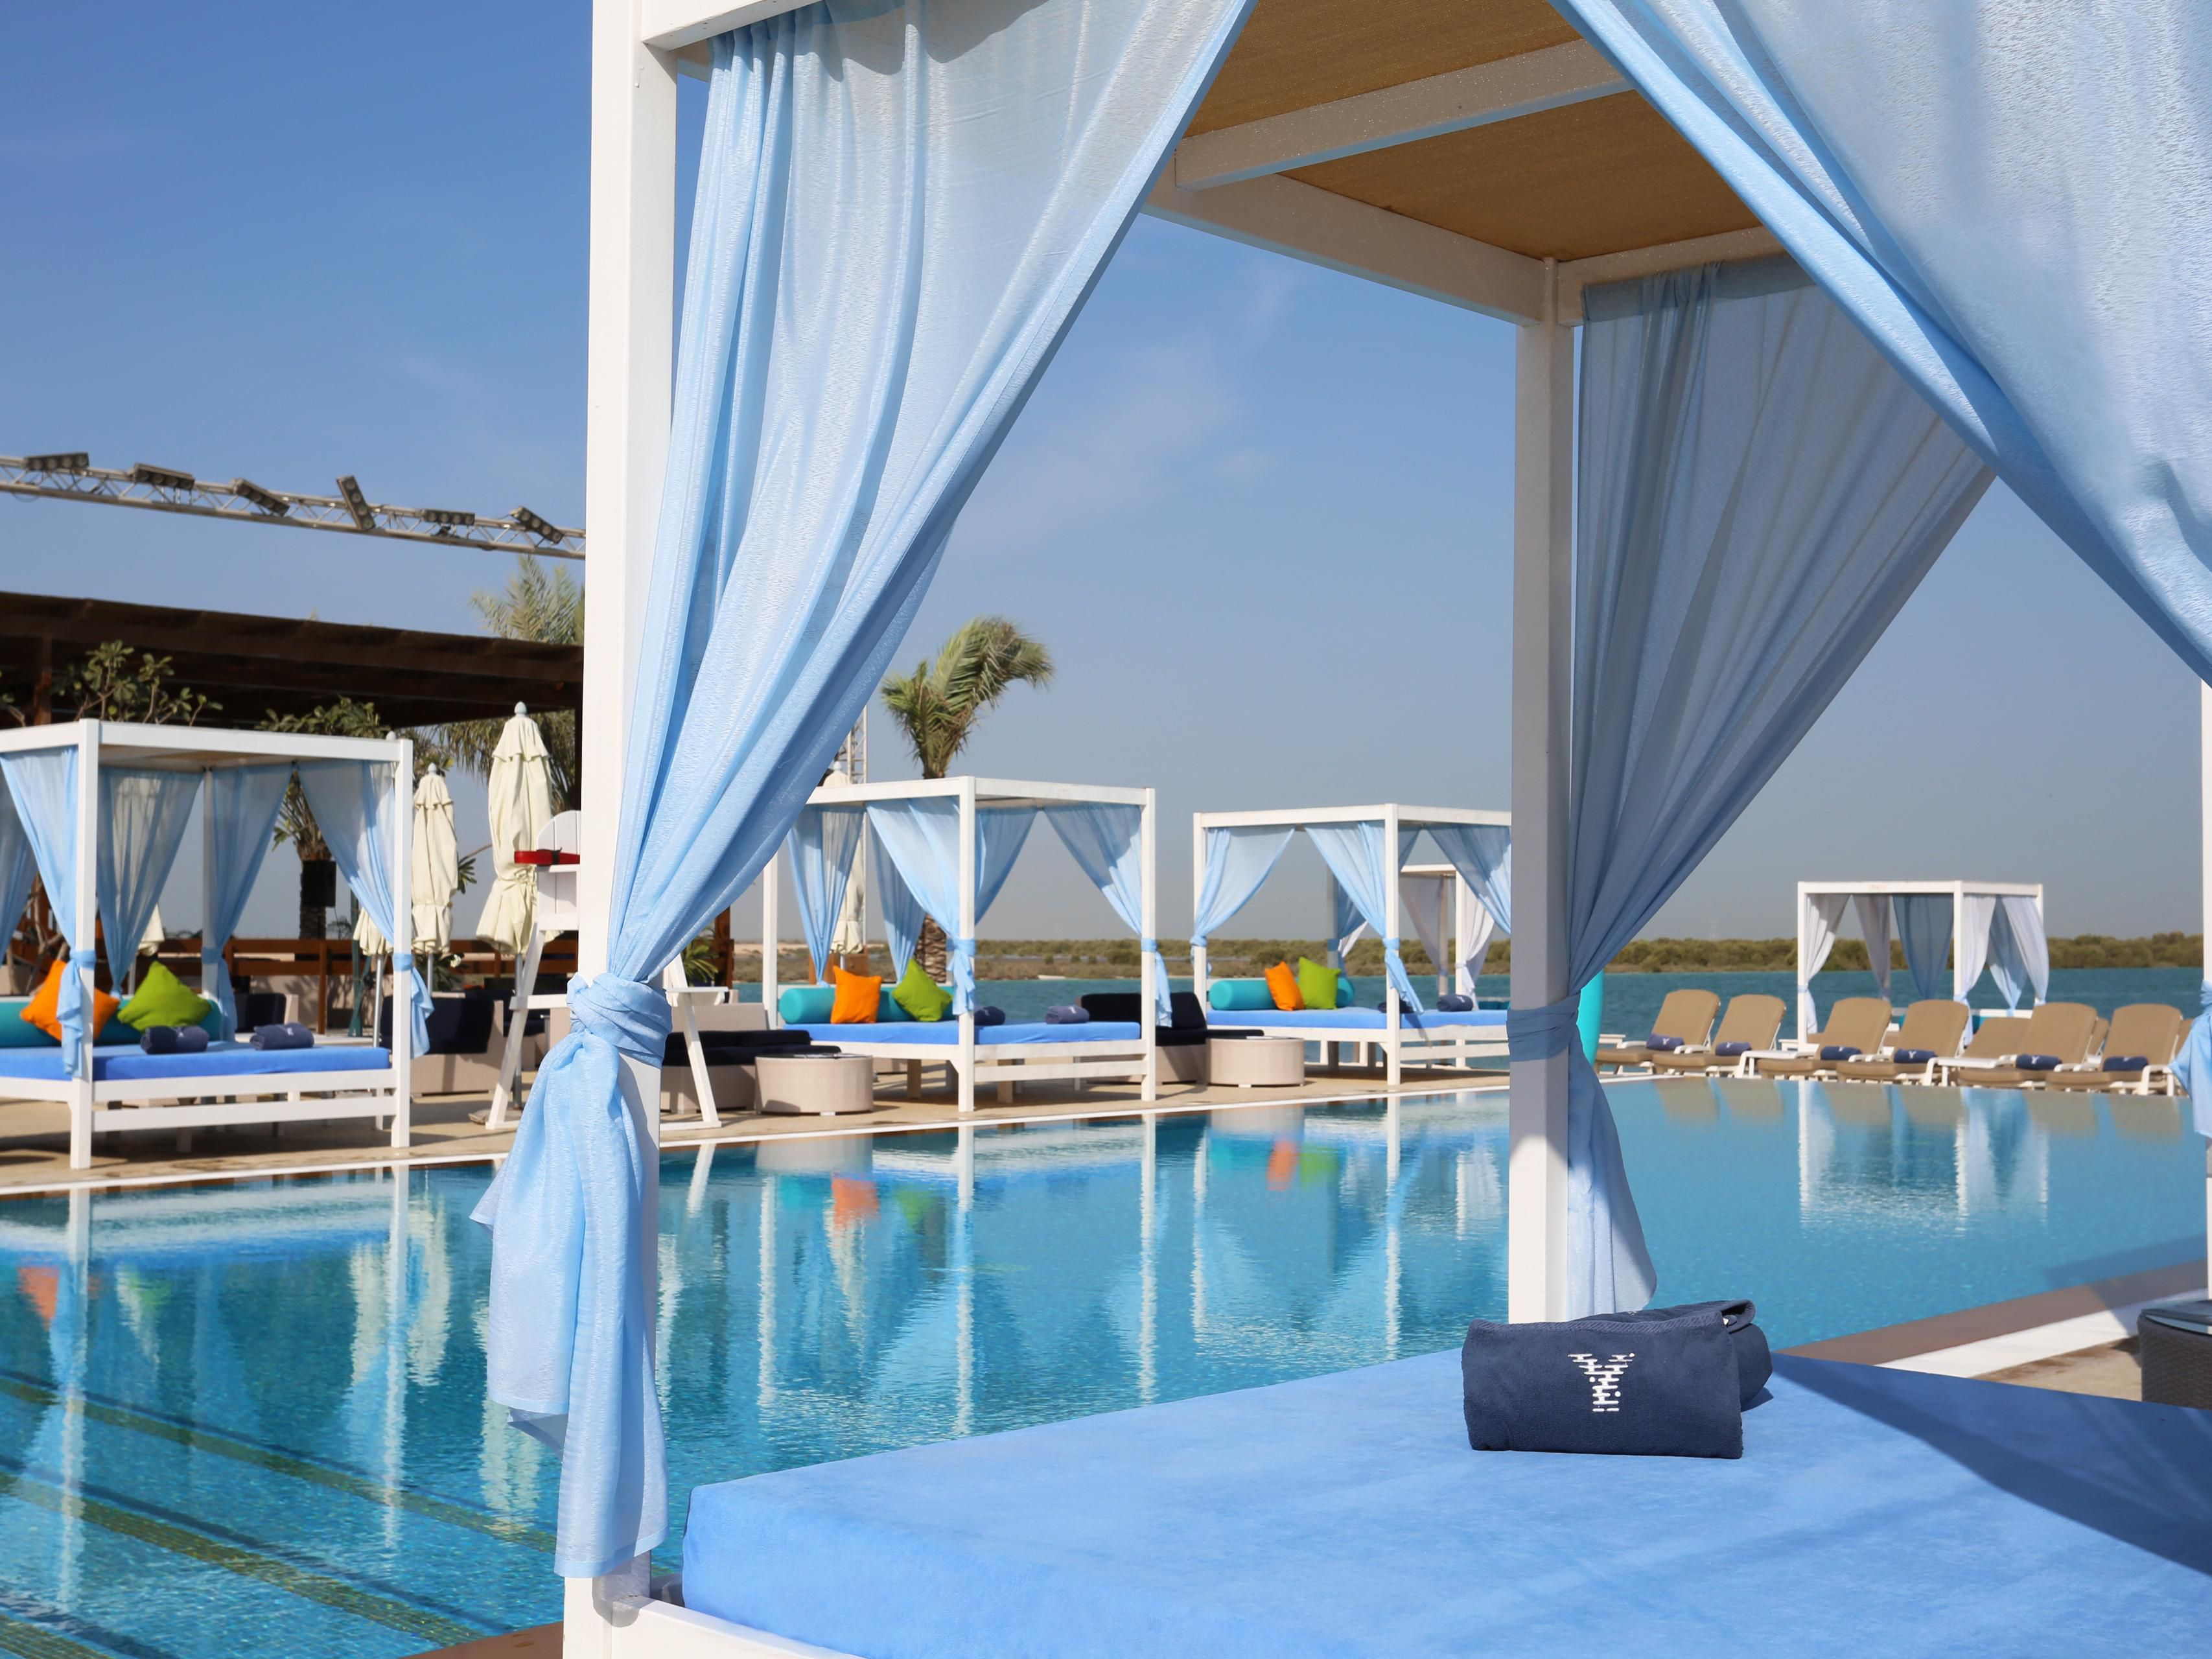 Hotel Nevis Wellness And Spa Crowne Plaza Abu Dhabi Yas Island Health And Fitness Facilities